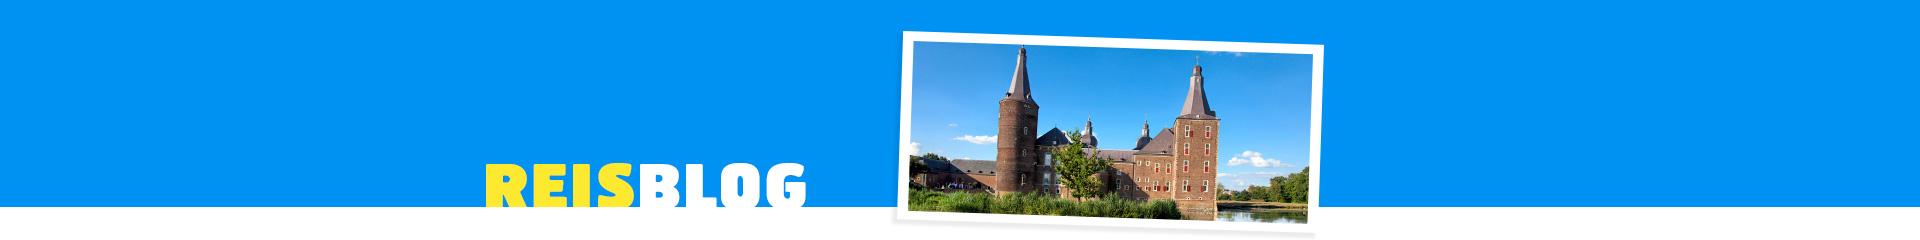 Wat te doen in Limburg, de leukste highlights